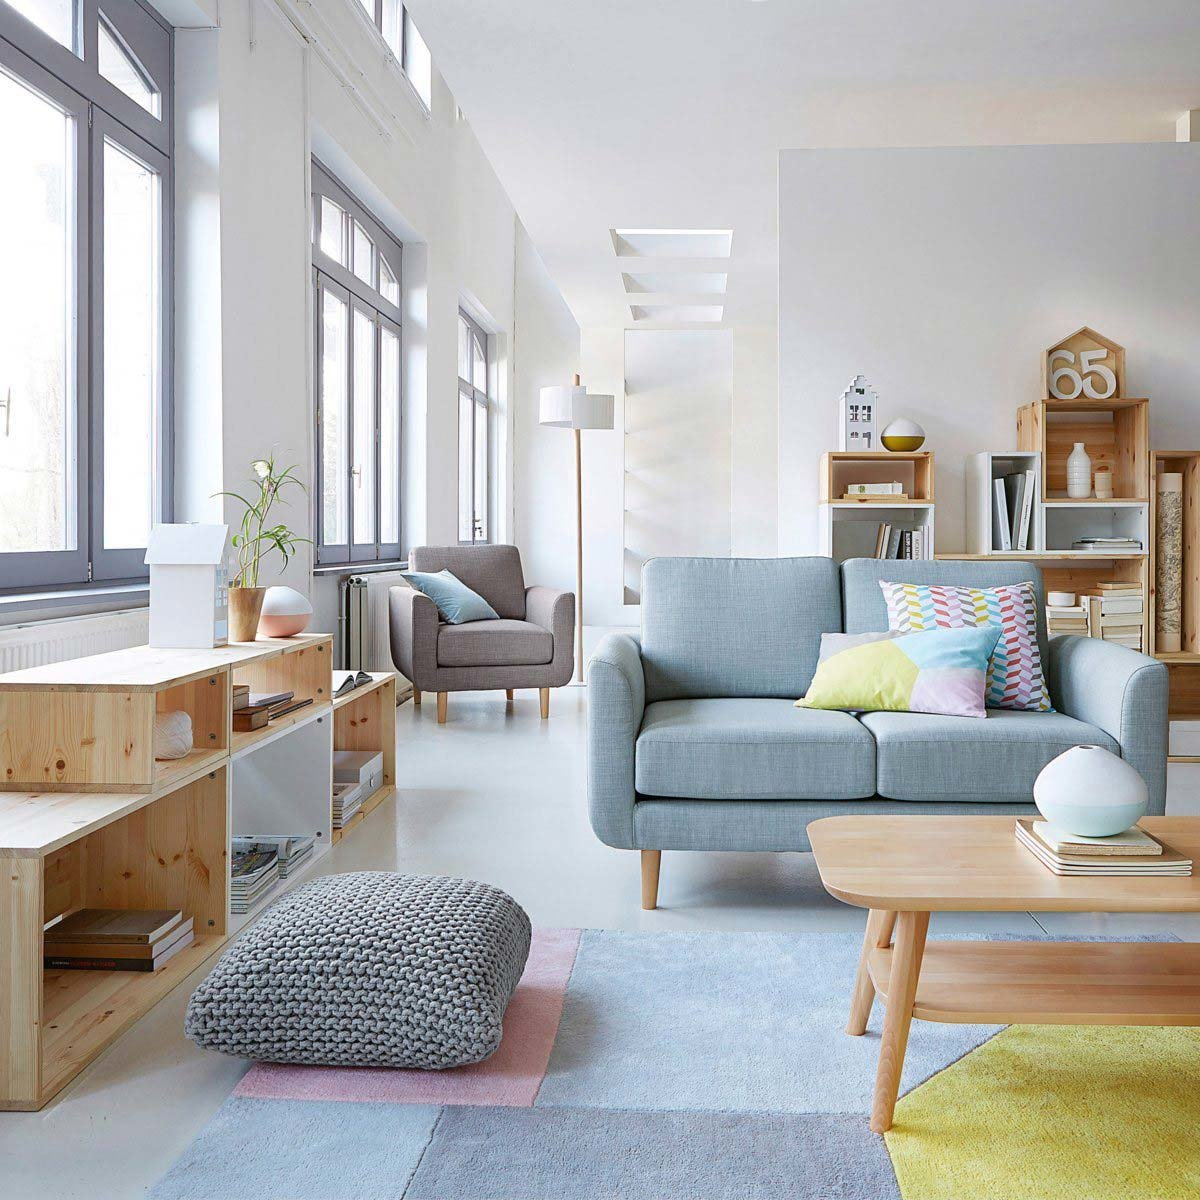 Salon scandinave bleu blanc gris jaune rose bois textile ...